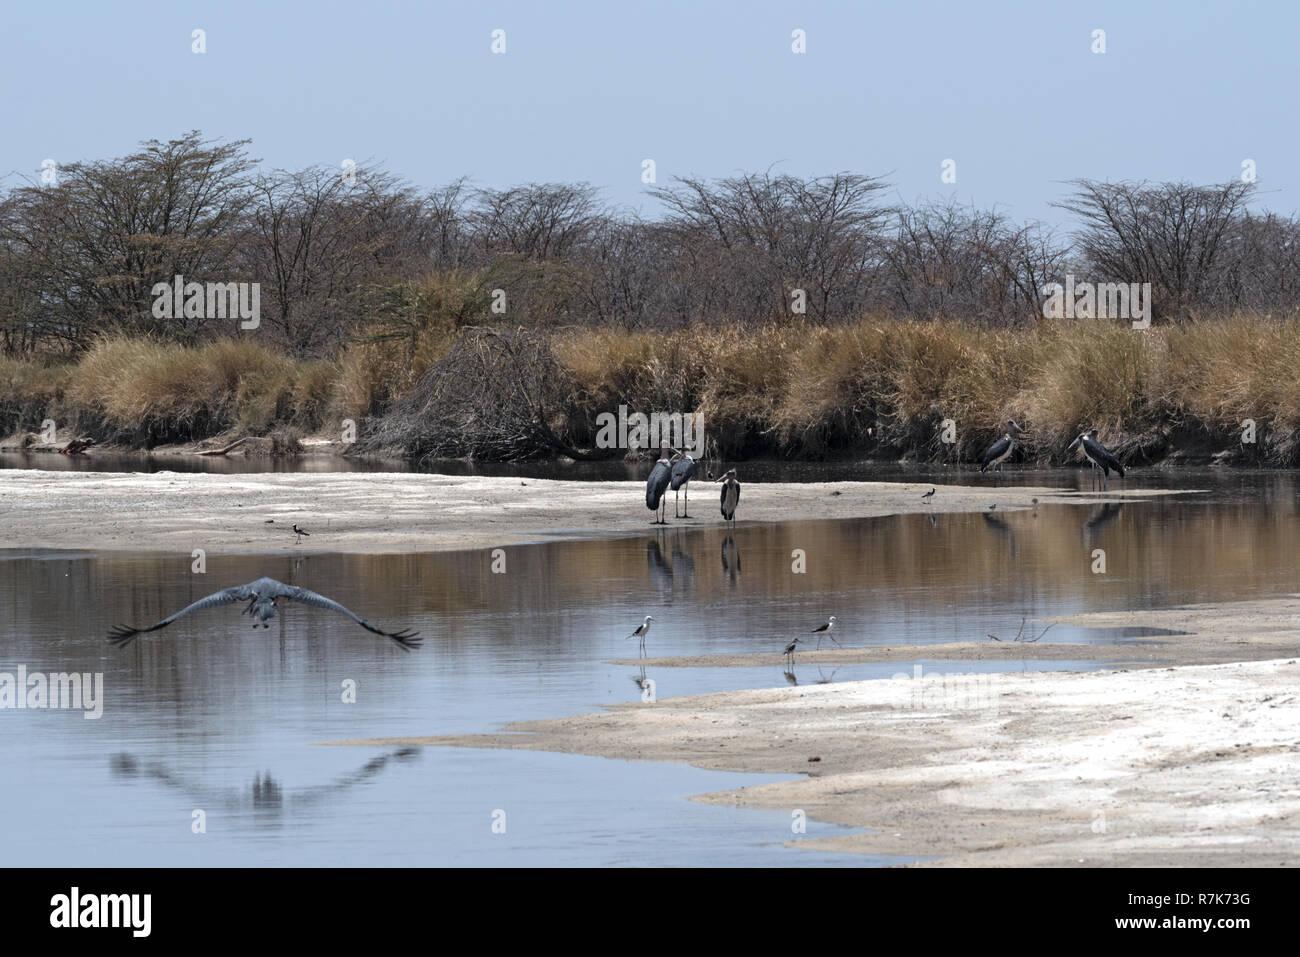 Marabou storks on the Nata River in the Nata Sanctuary, Botswana - Stock Image